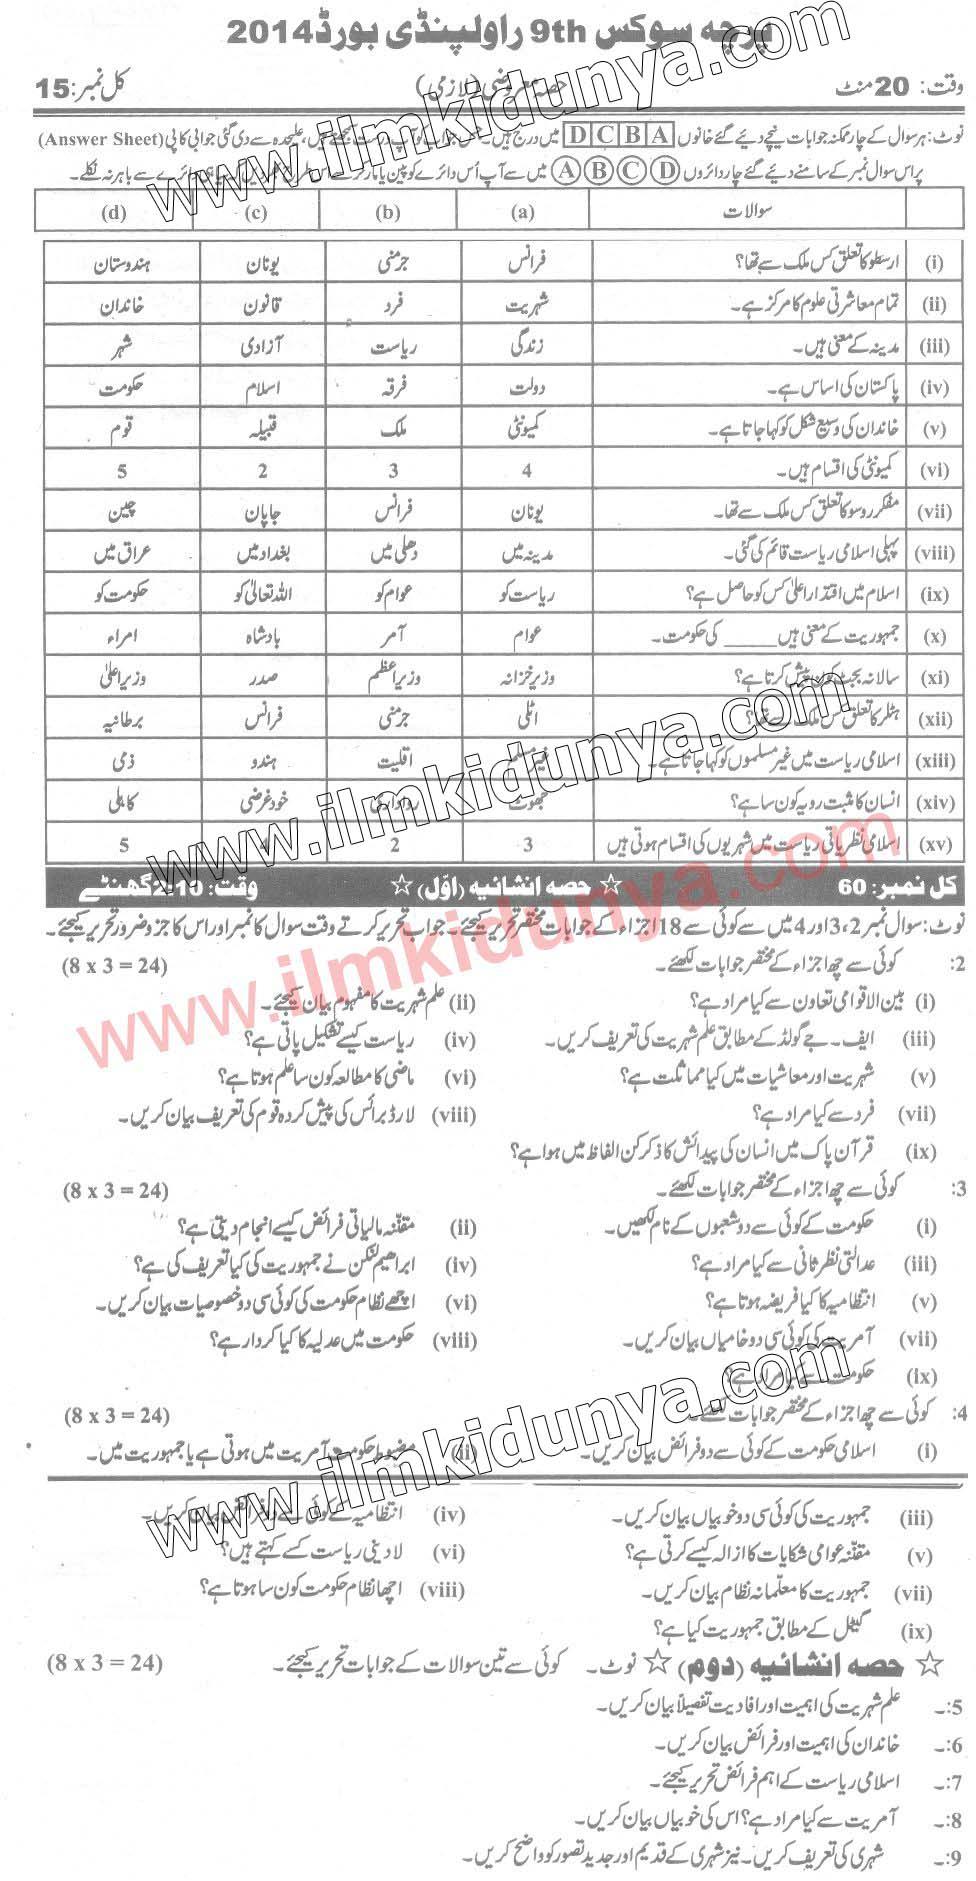 Past Papers 2014 Rawalpindi Board 9th Class Civics Urdu